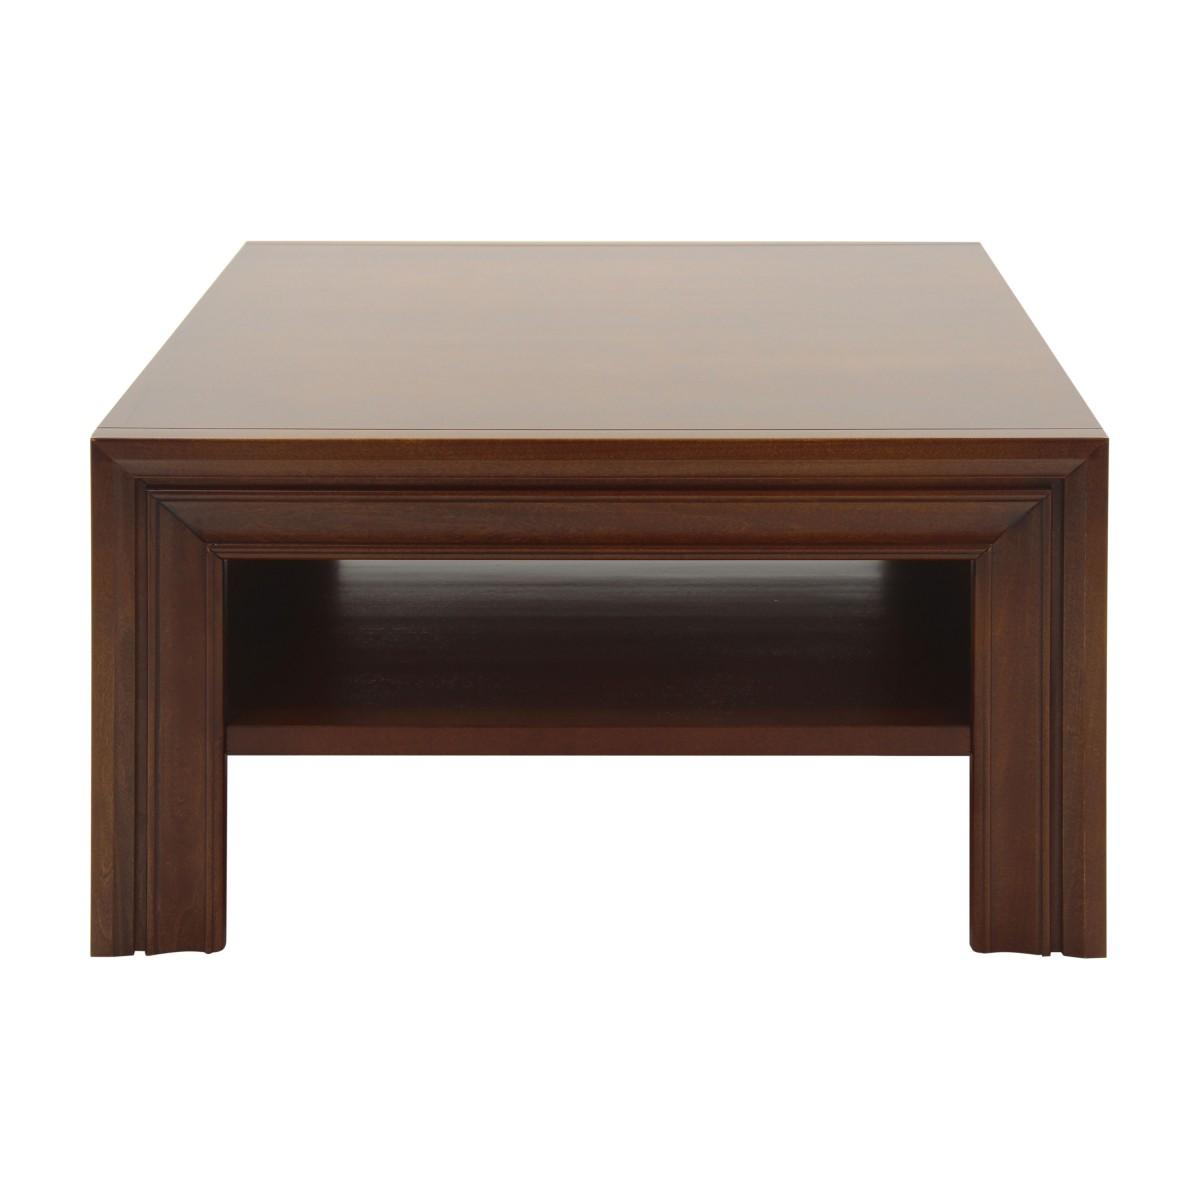 Small table Atreo - Sevensedie